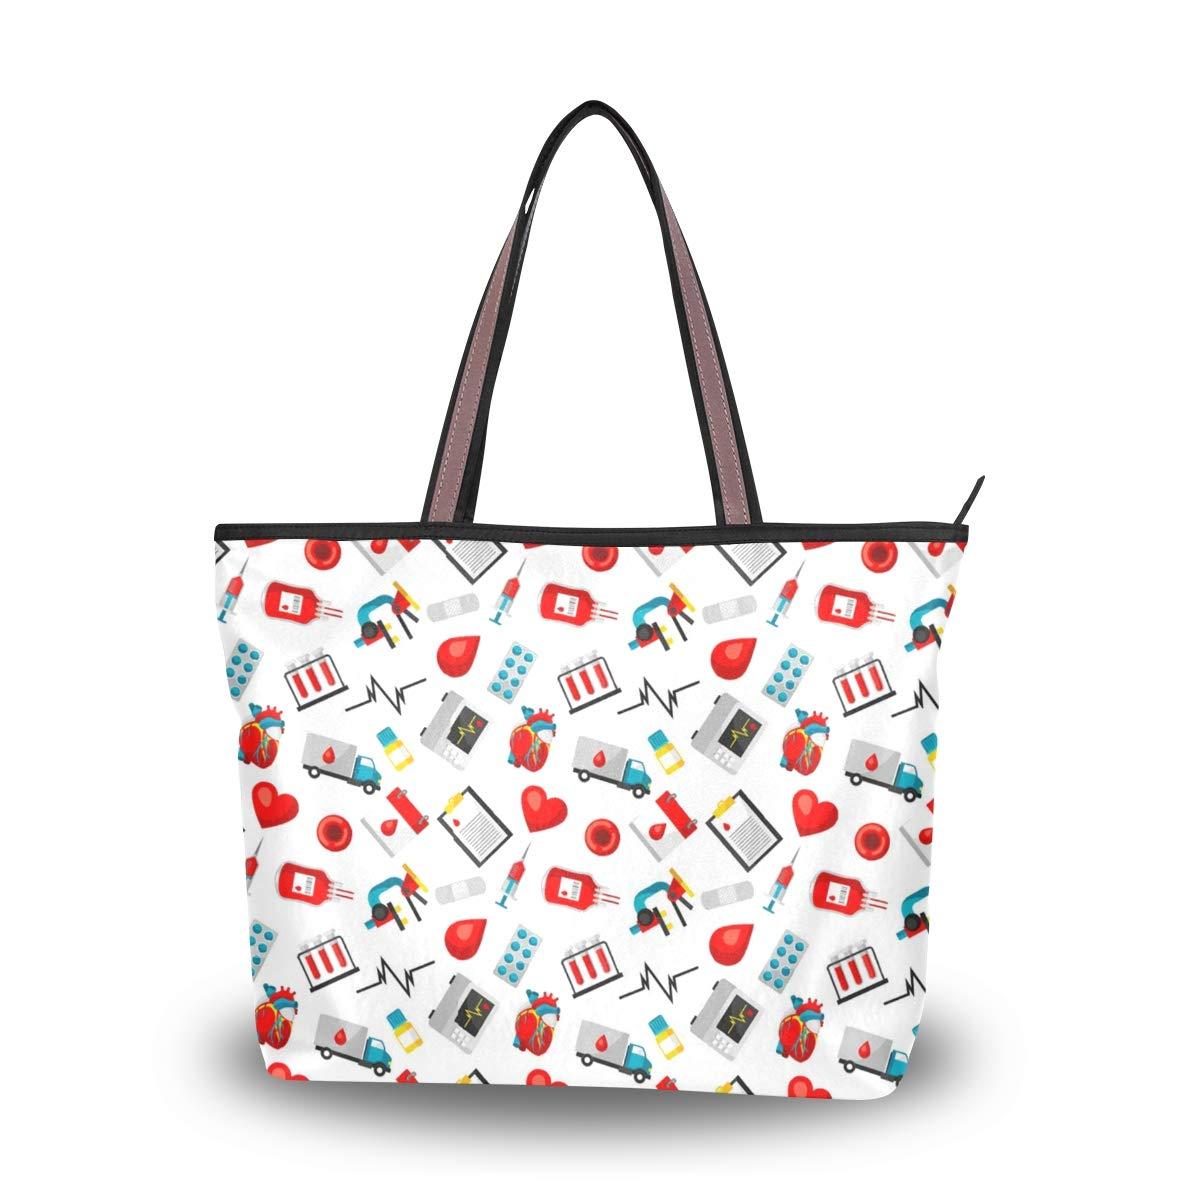 Women Blood Donation Pattern Large Tote Bag Shoulder Bag Lightweight For Gym Hiking Picnic Travel Beach Waterproof Handbag